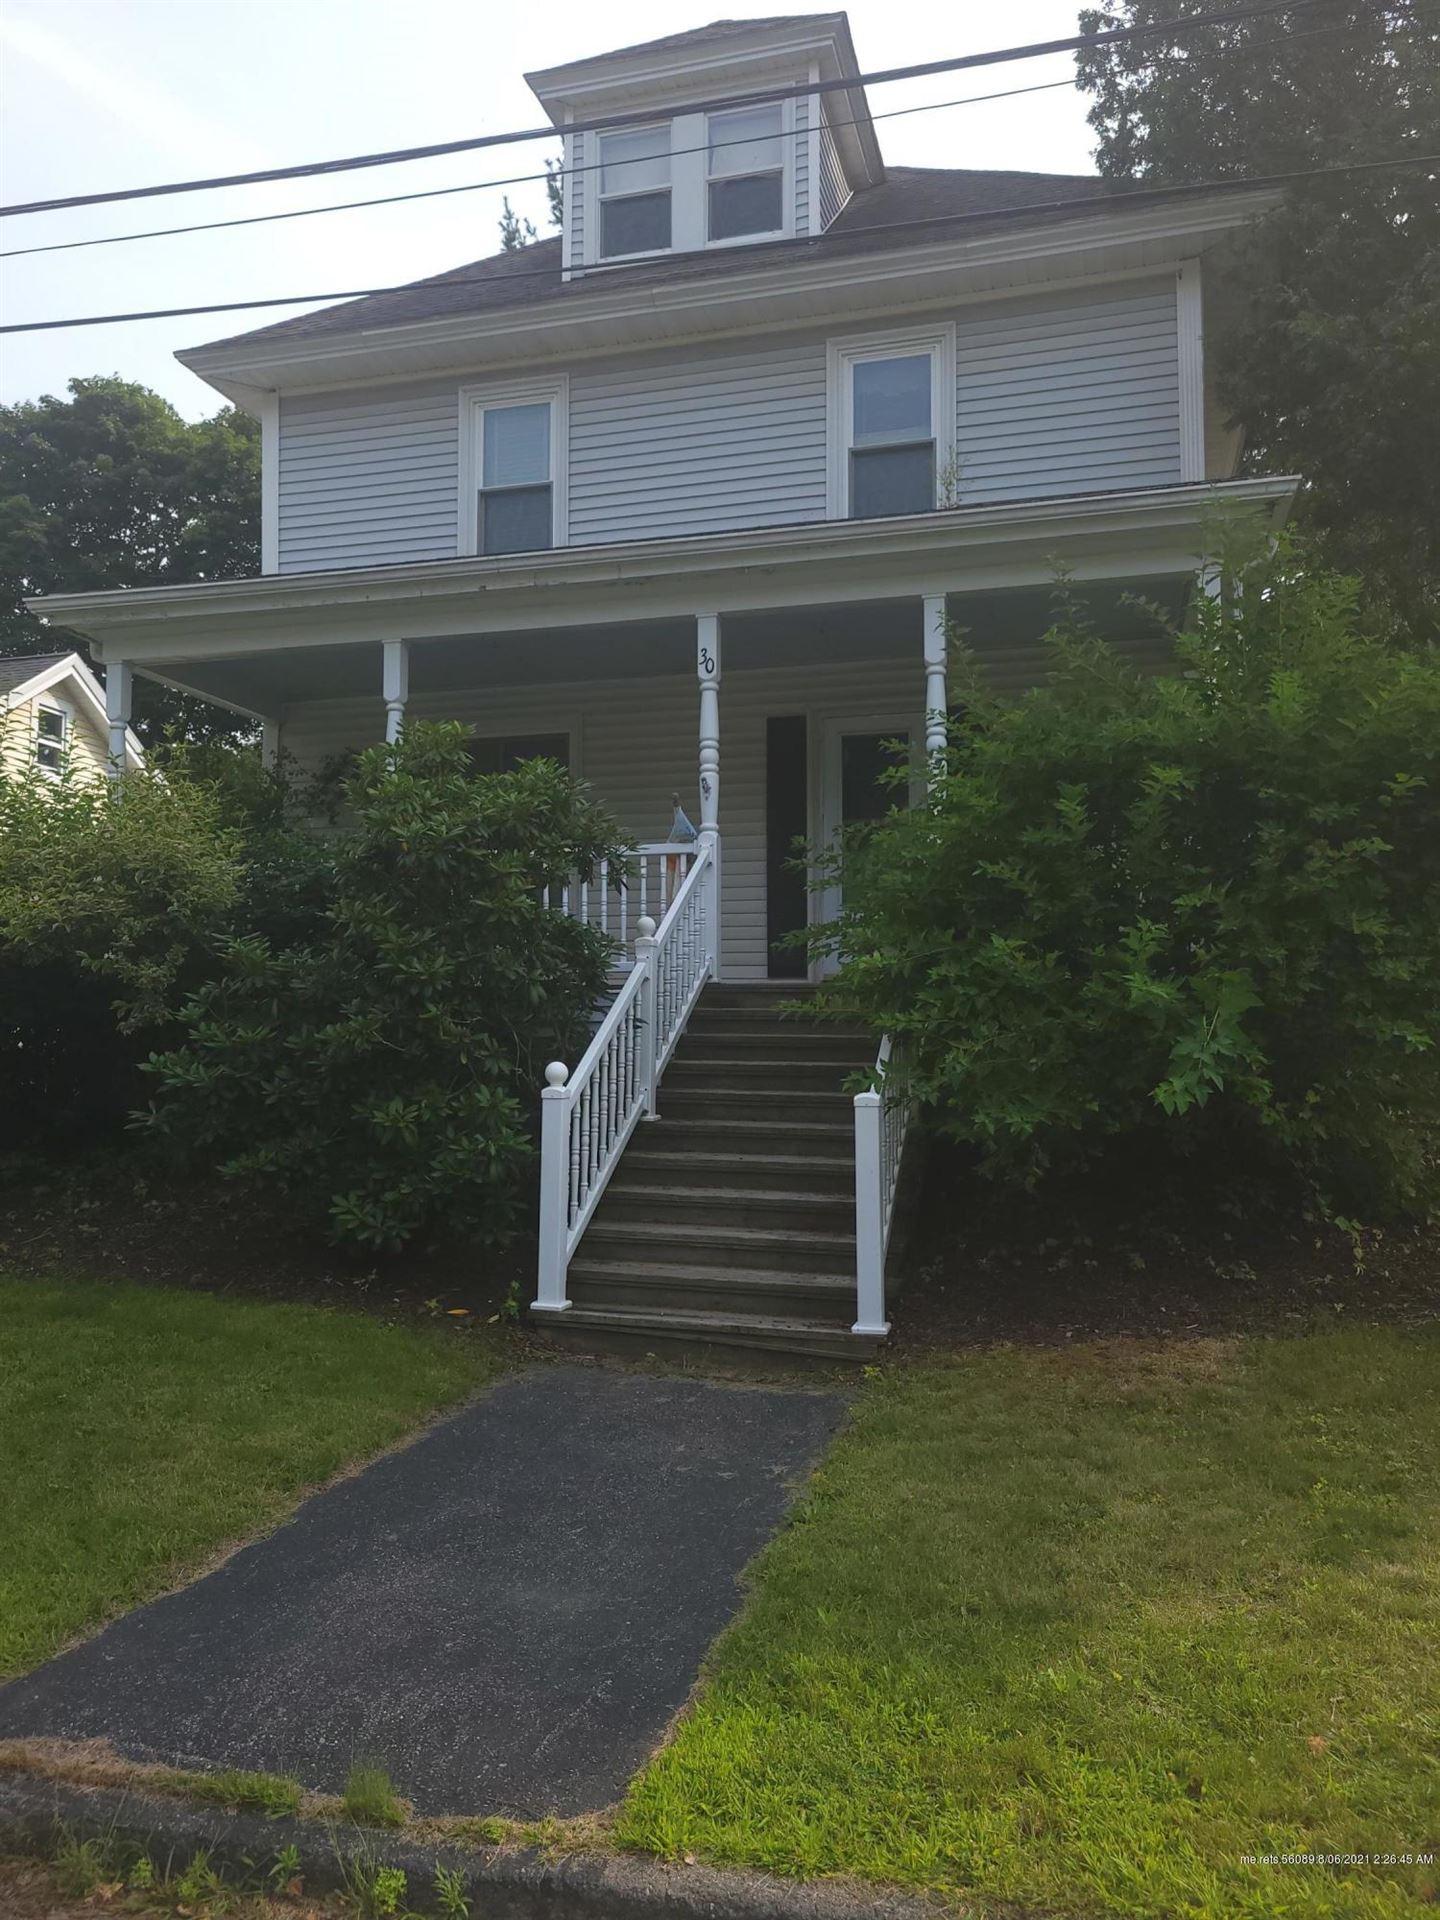 Photo of 30 Tyler Avenue, Bangor, ME 04401 (MLS # 1503767)